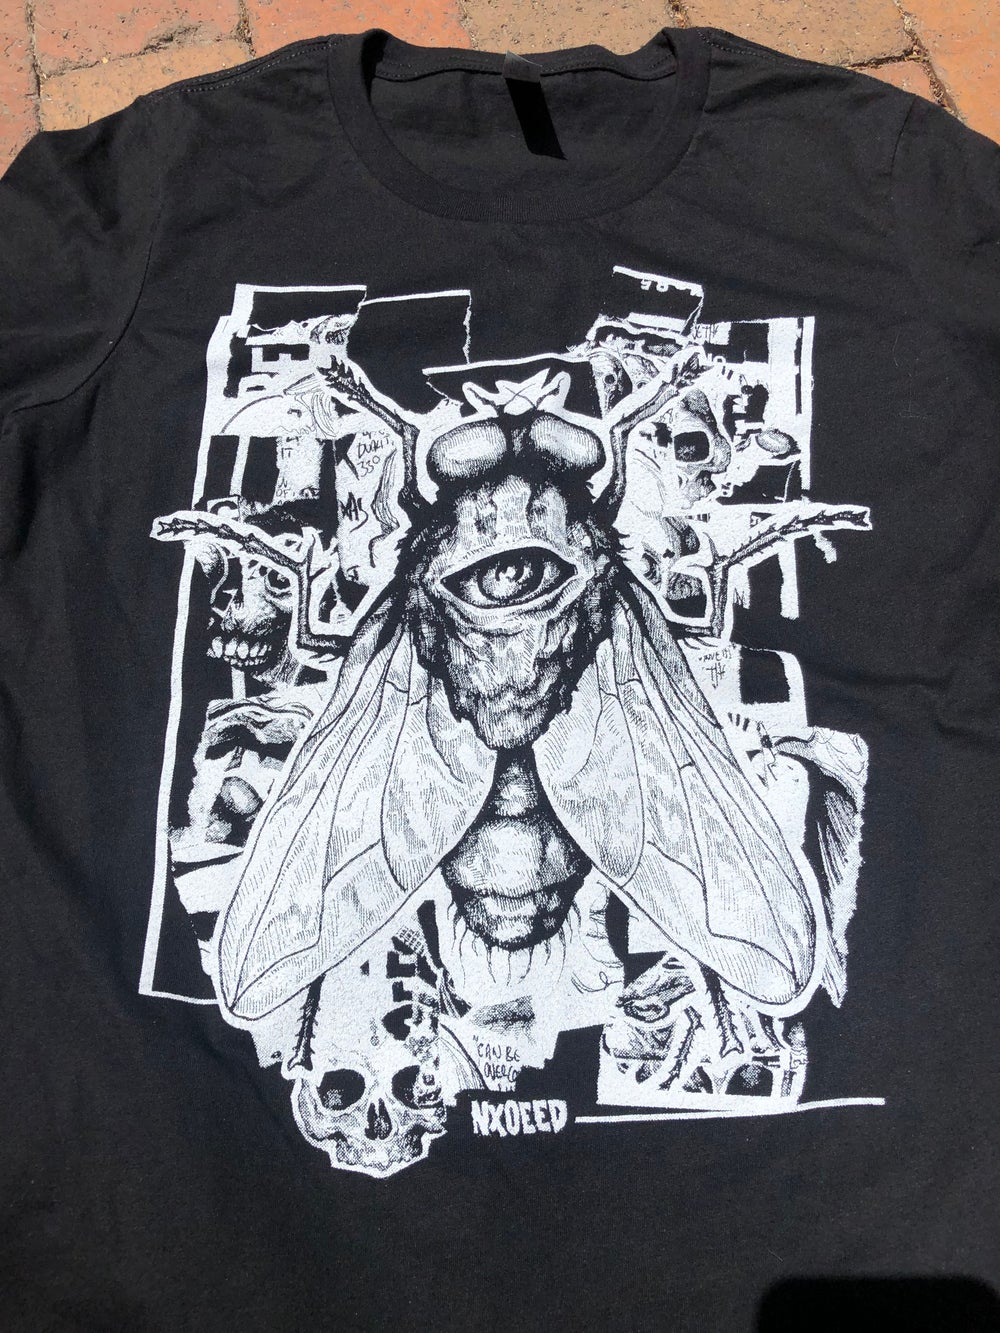 NXOEED shirt (MEN & LADIES CUTS)